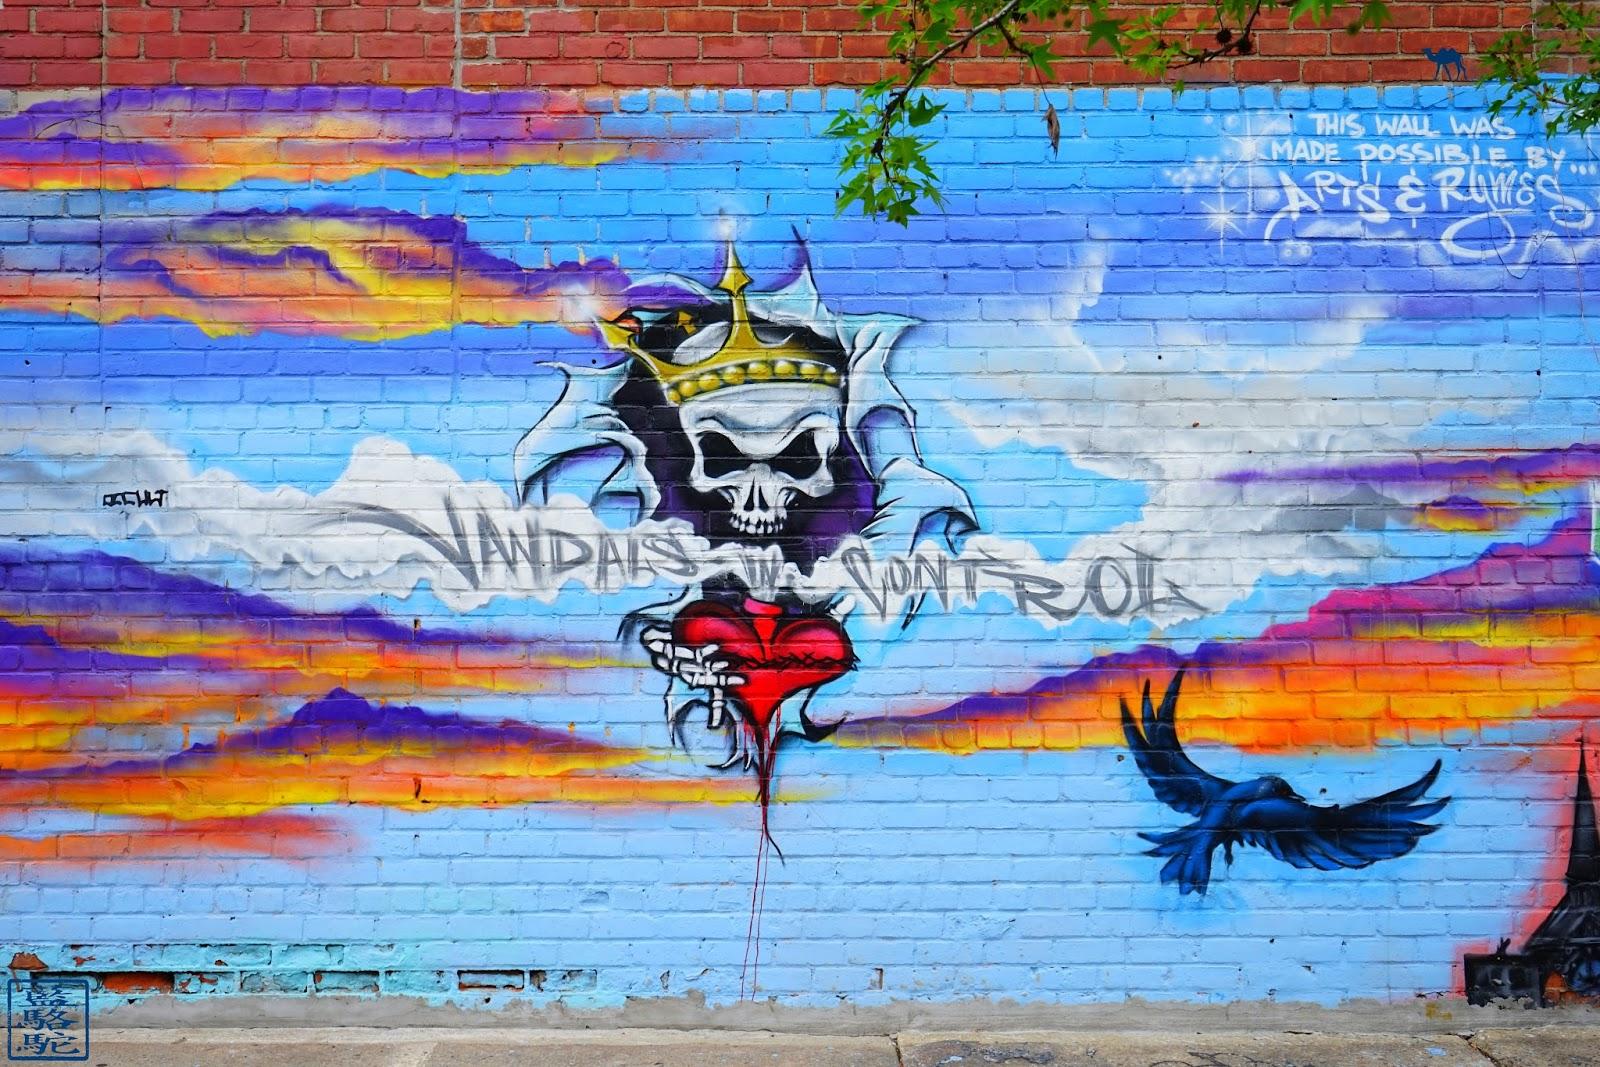 Le Chameau Bleu - Blog Voyage New York City Street Art Bushwick 2017 -Vandals in Control- New York